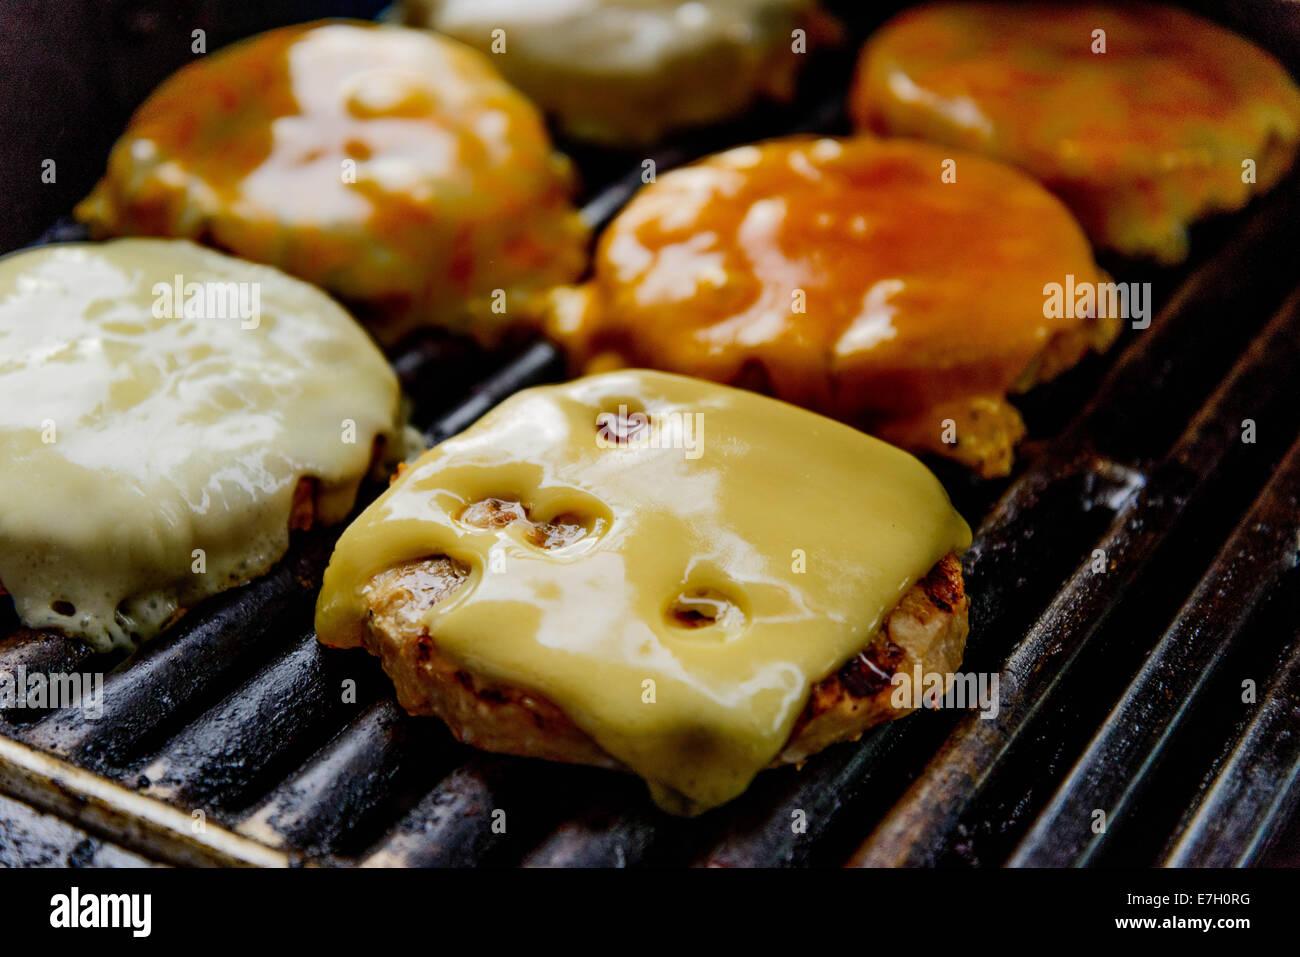 Hamburguesas de queso cocinar a la parrilla Imagen De Stock